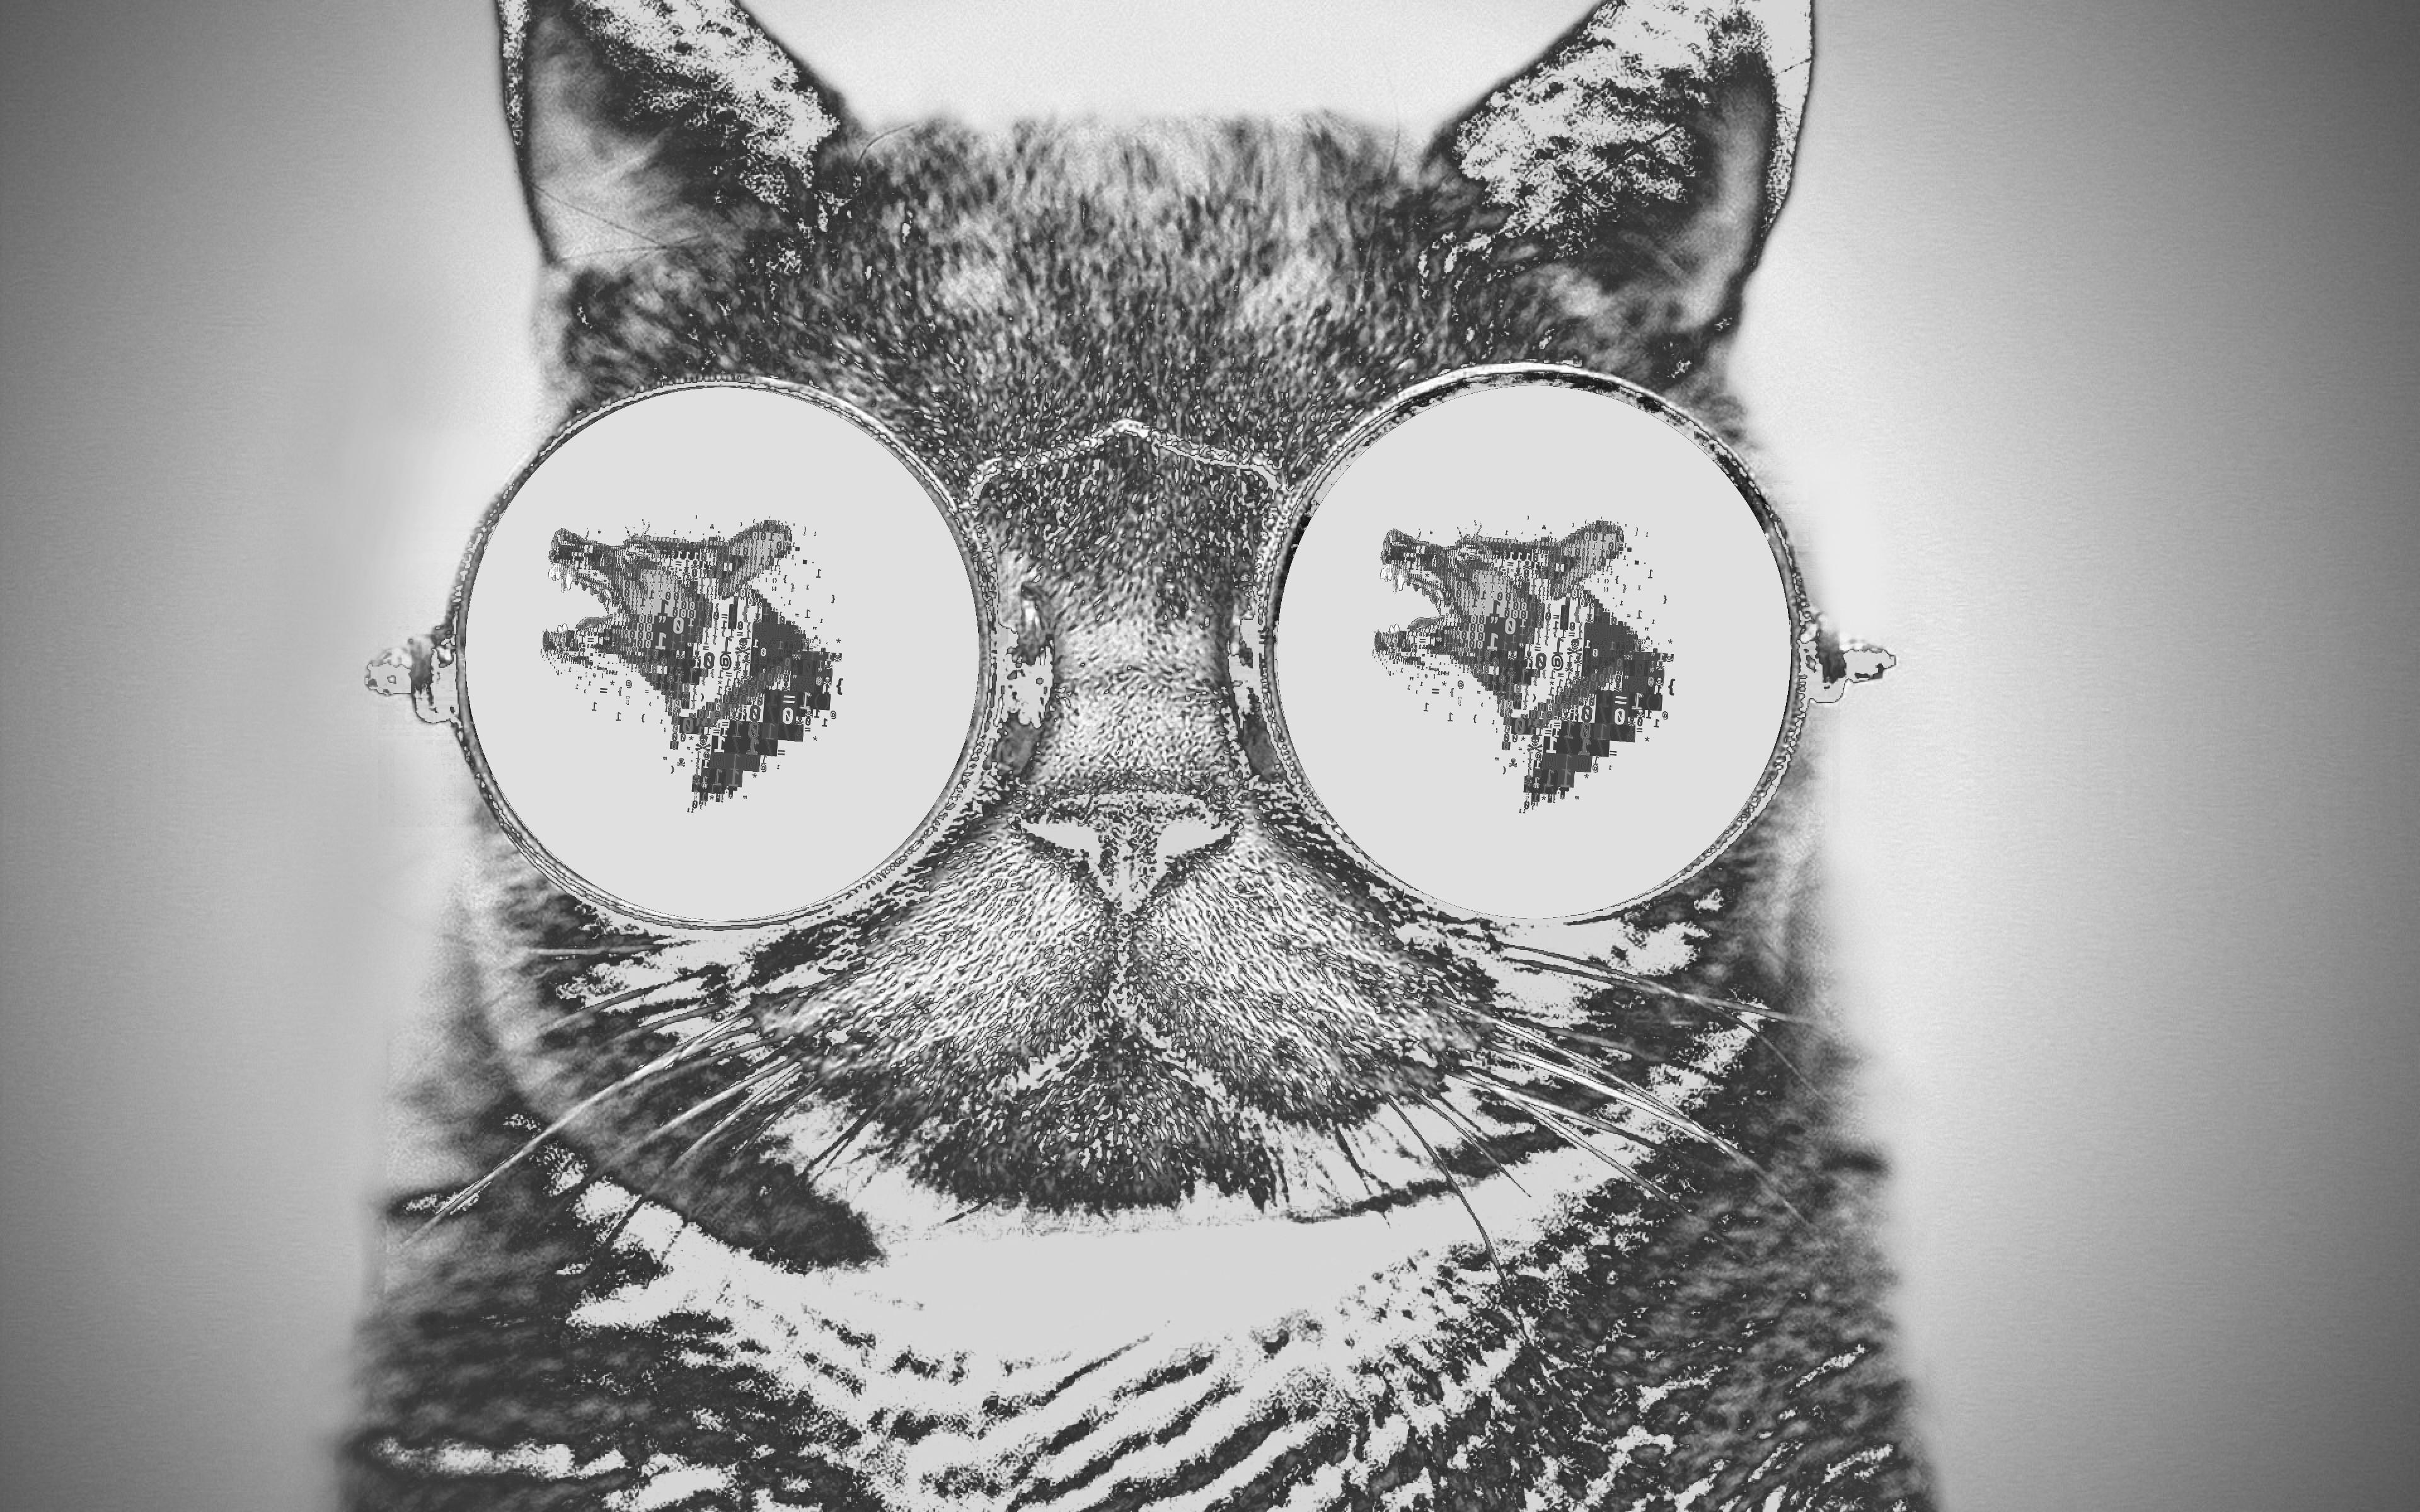 Fondos De Pantalla Dibujo Ilustración Gato Animales